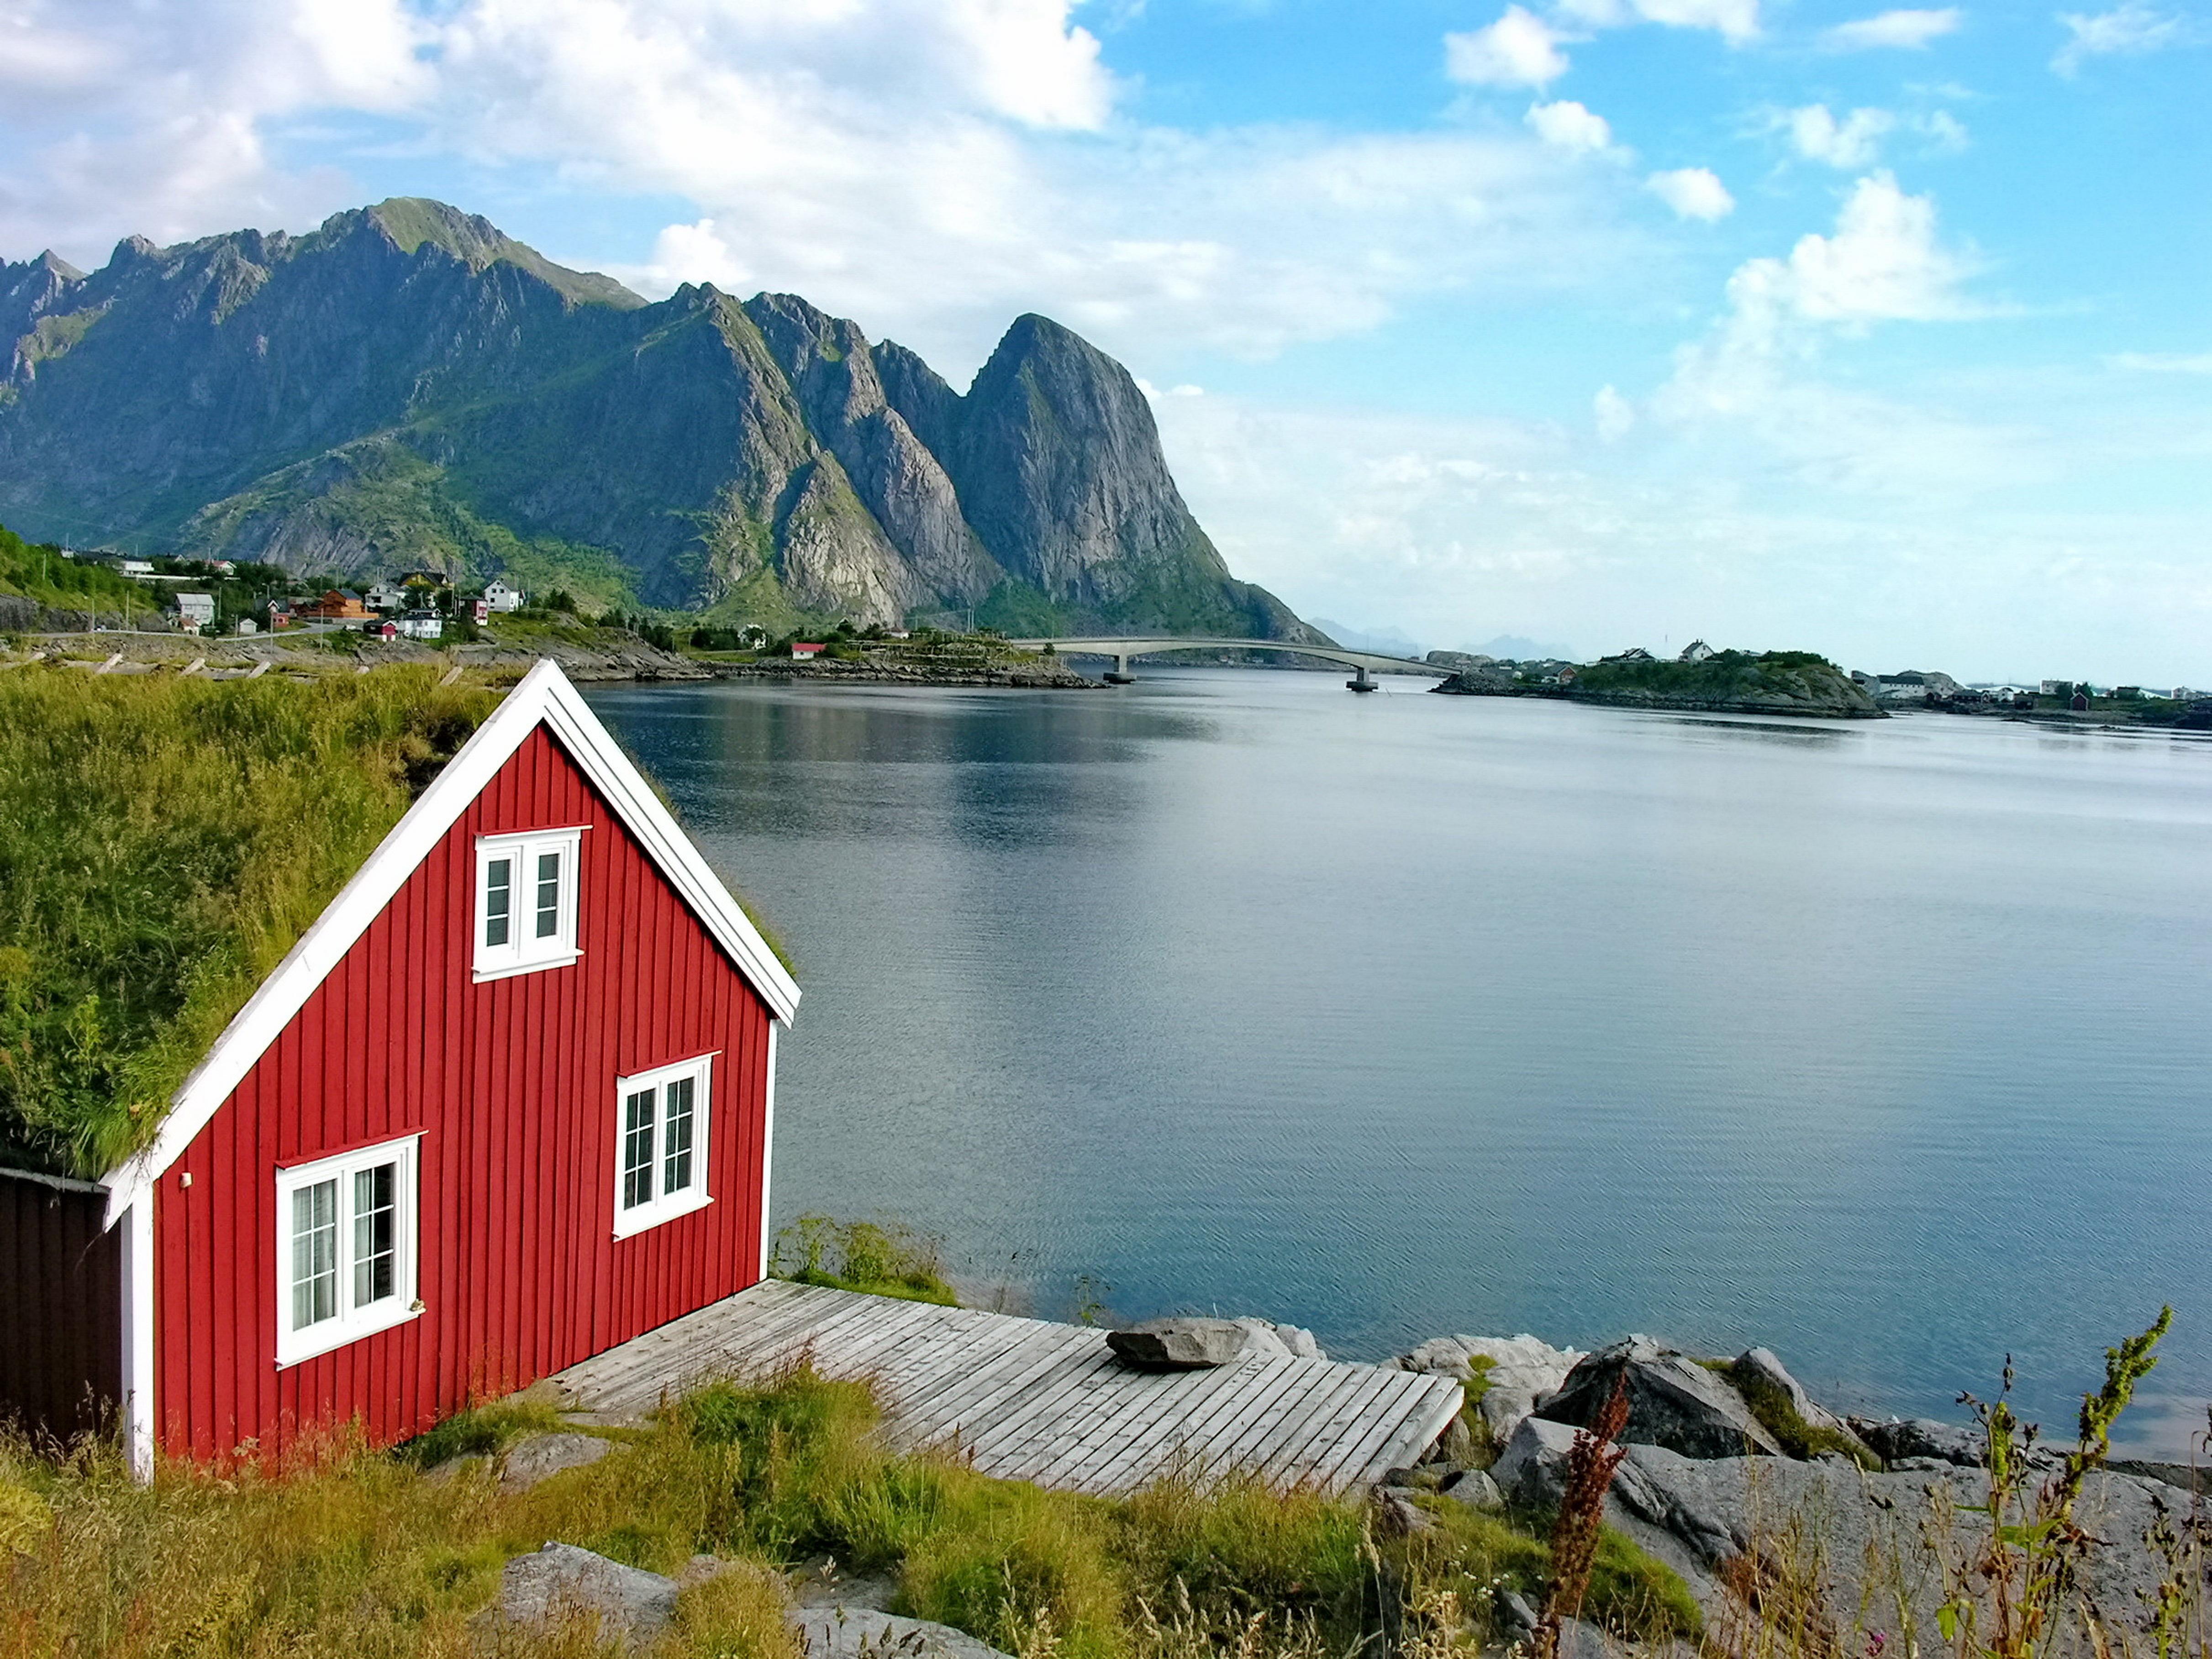 Norway-fjord-shutterstock_67676209